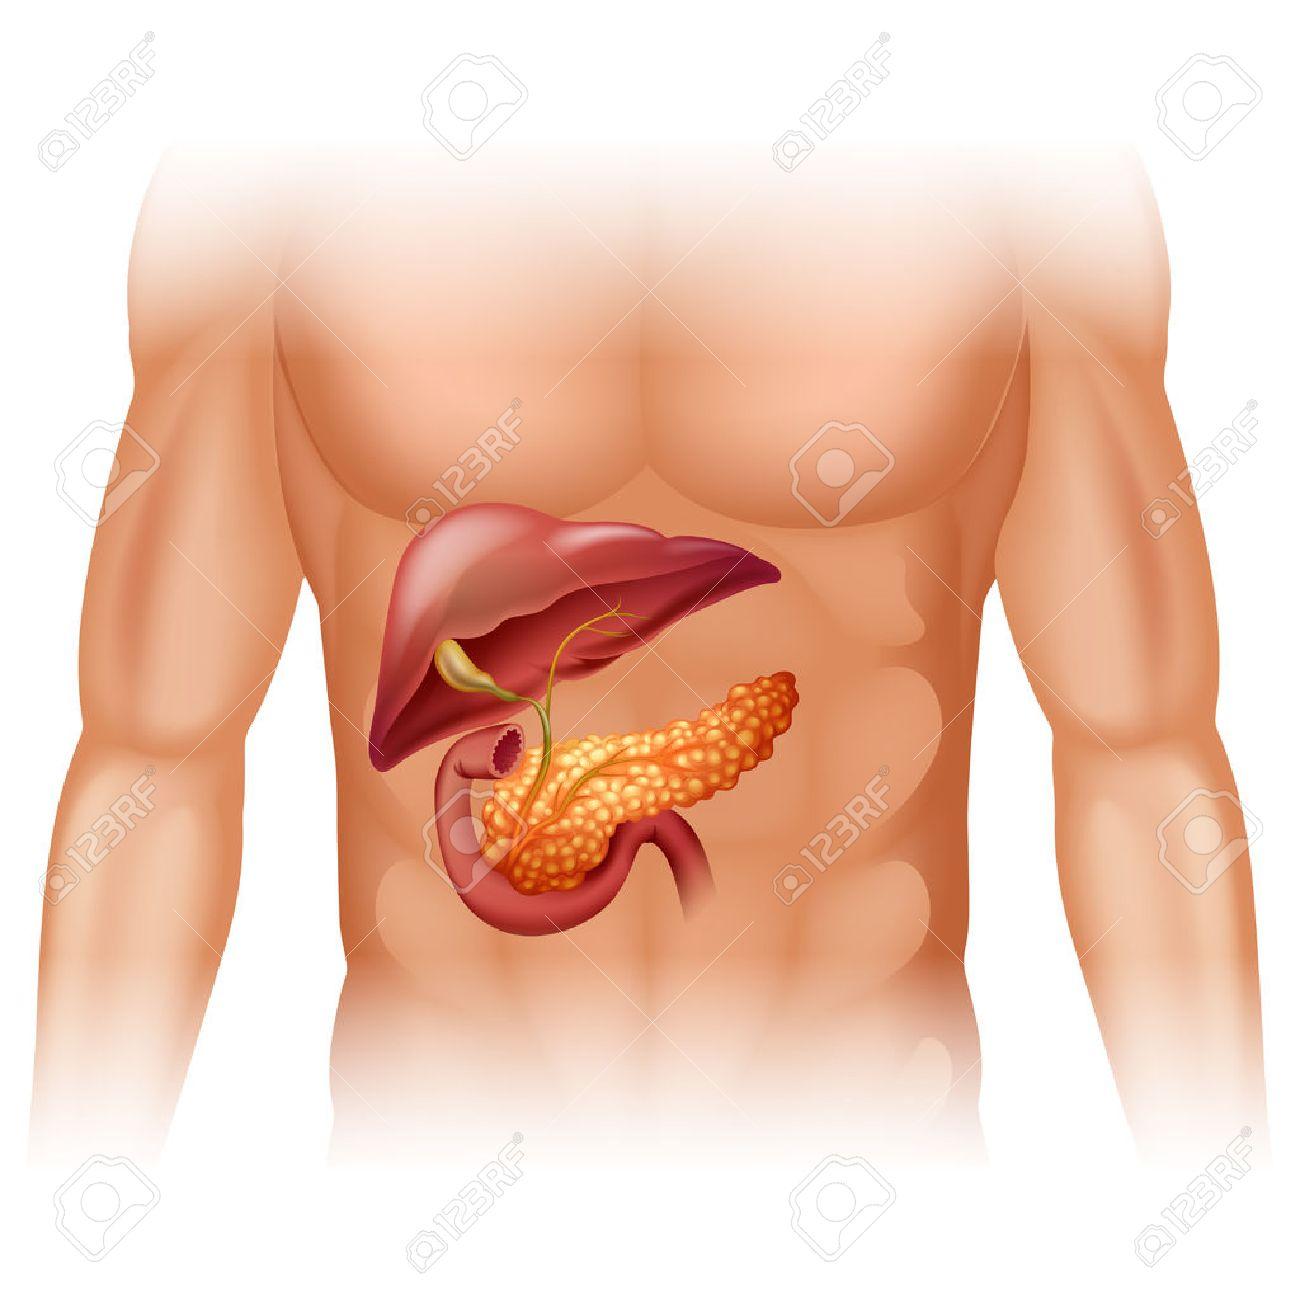 Pancreas stock photos royalty free pancreas images pancreas cancer diagram in detail illustration illustration ccuart Choice Image